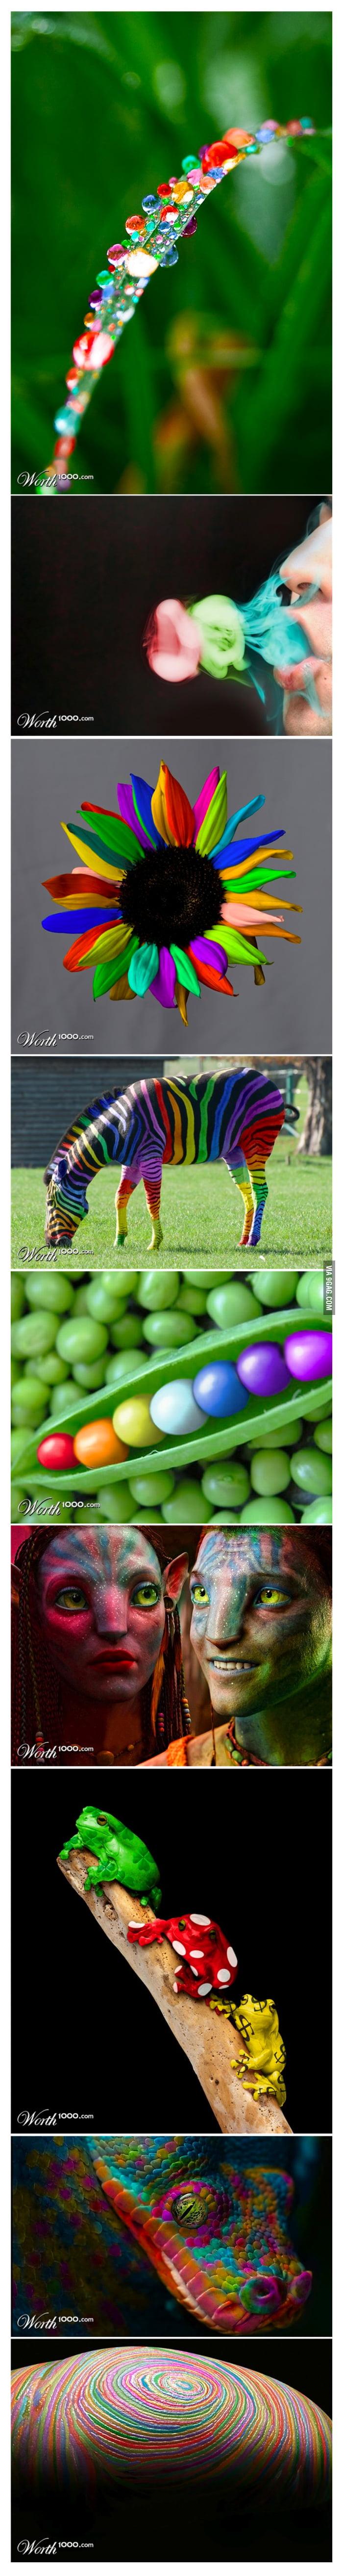 Just a rainbow photoshop contest